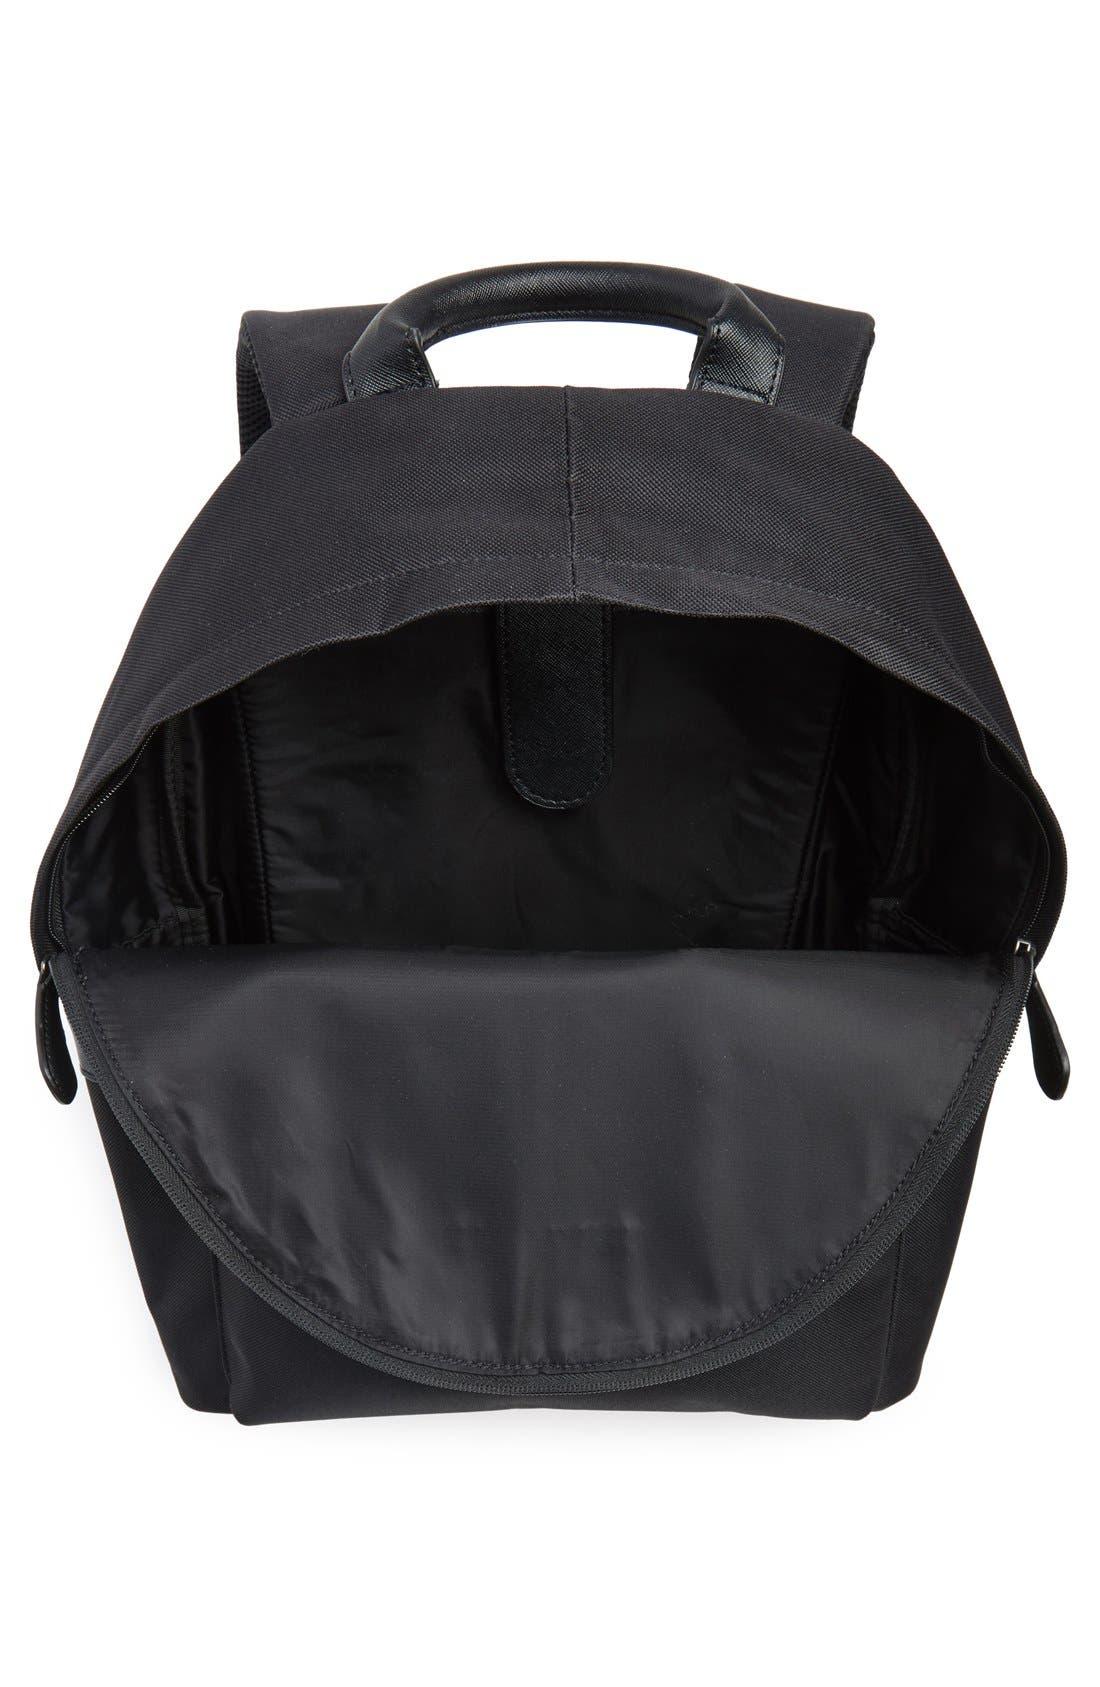 'Seata' Nylon Backpack,                             Alternate thumbnail 2, color,                             001